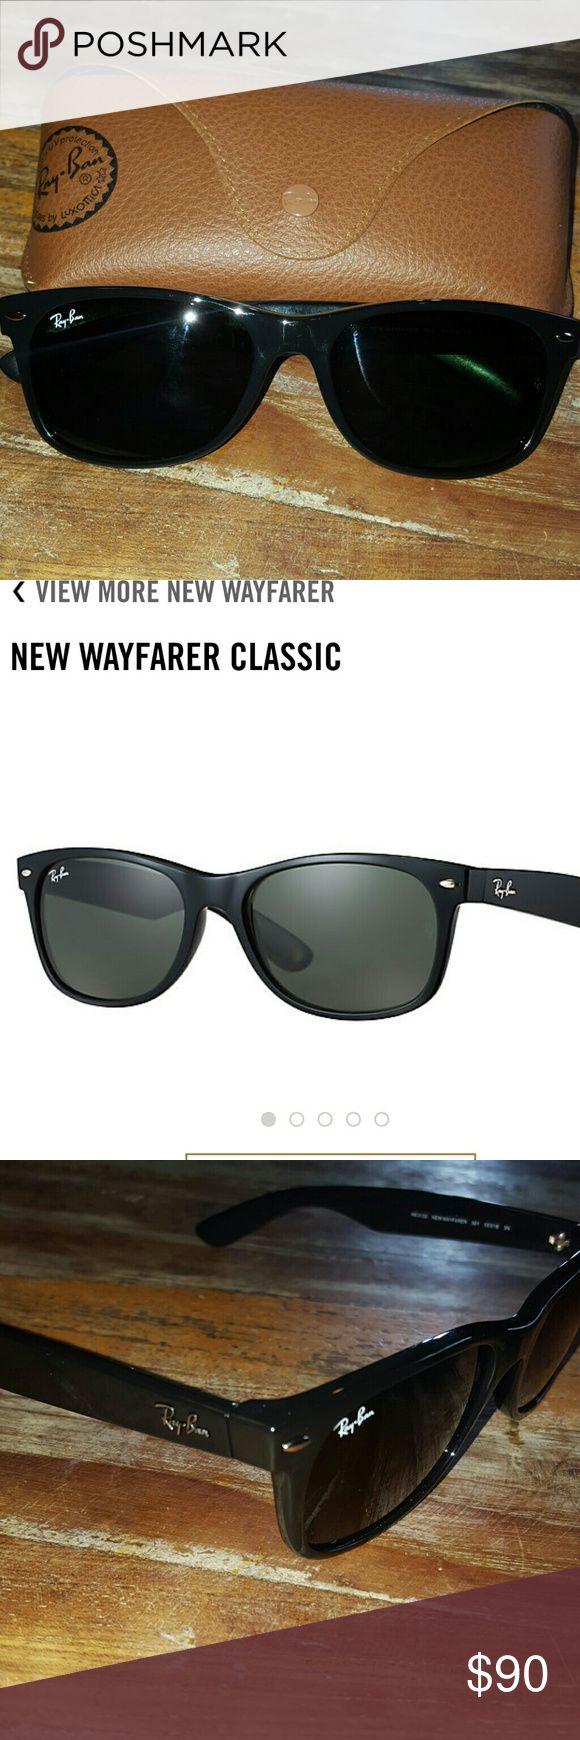 85405a65e3 ray ban wayfarer classic black blue mirrored polarized ray bans